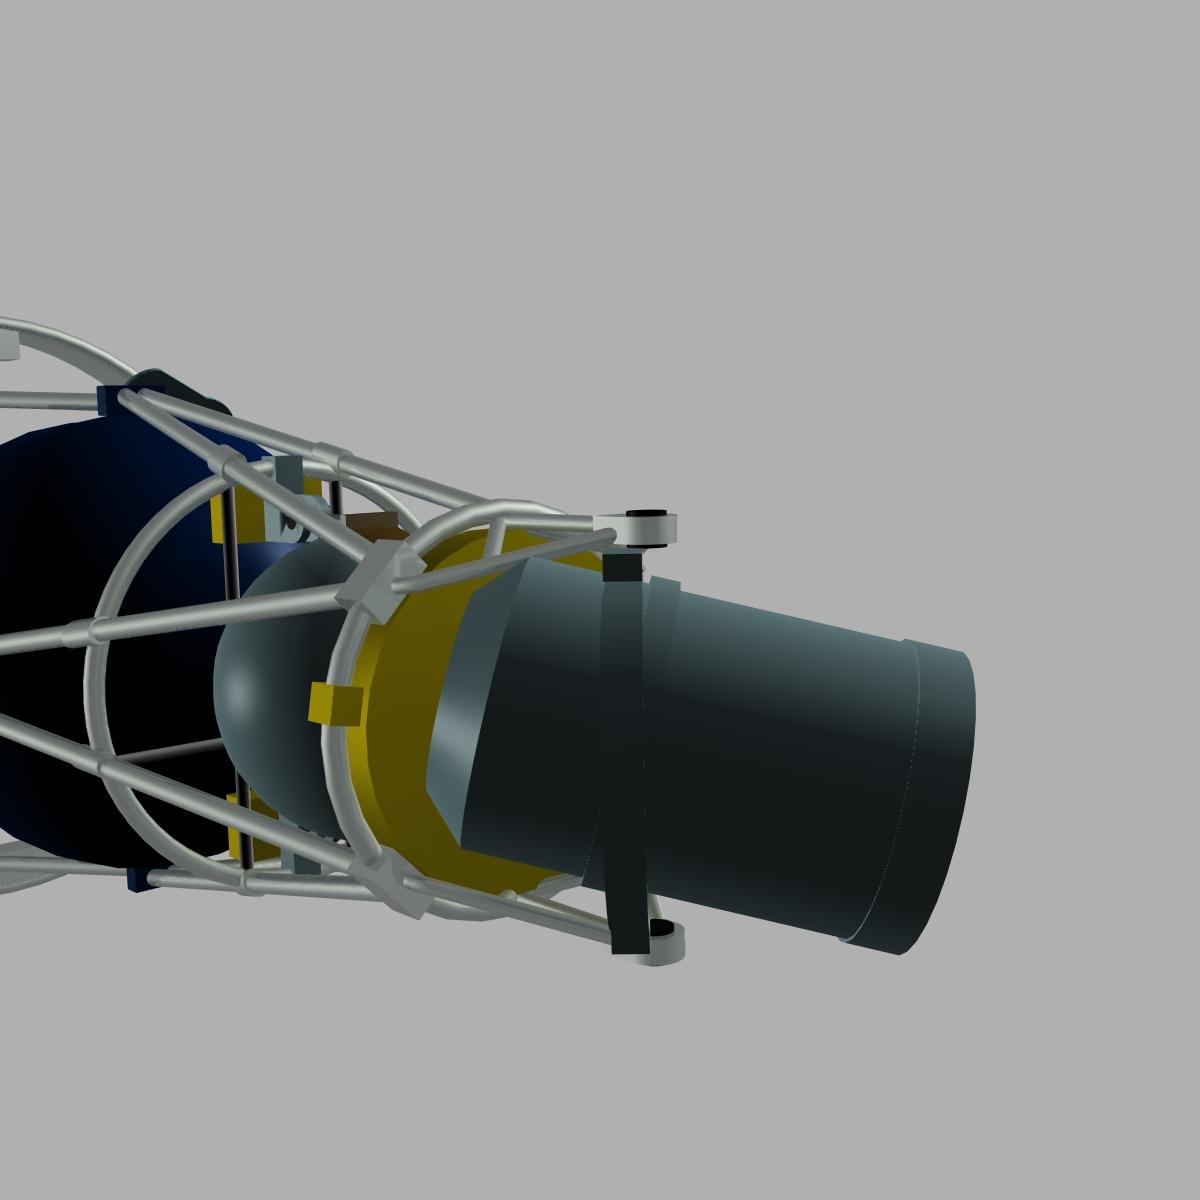 israeli arrow 3 missile 3d model 3ds dxf cob x other obj 136293